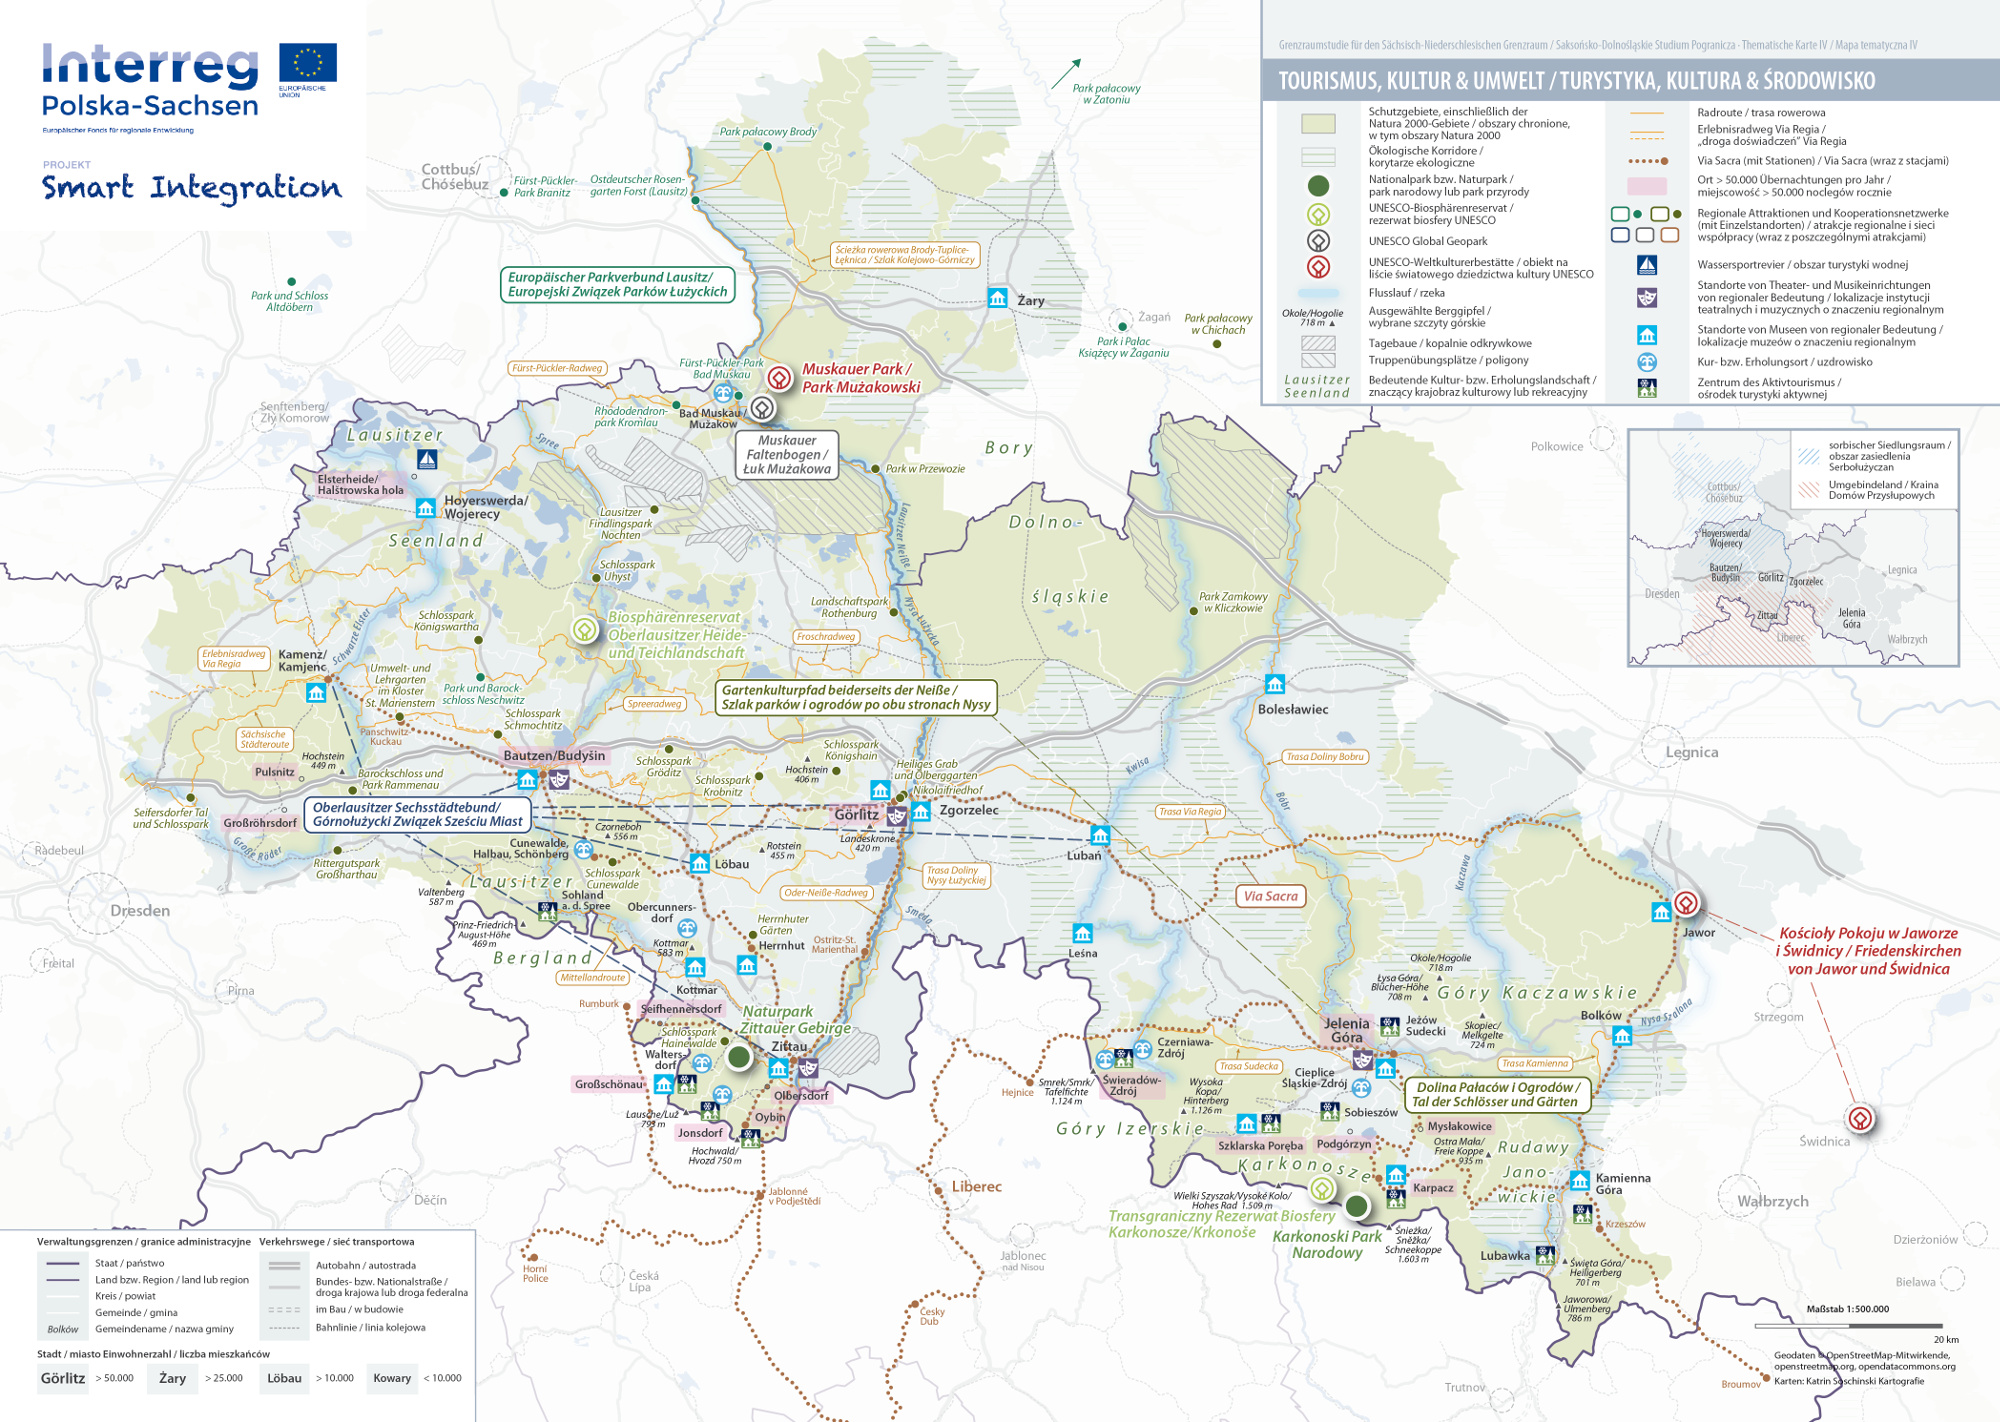 IV Tourismus, Kultur & Umwelt / Turystyka, kultura & środowisko